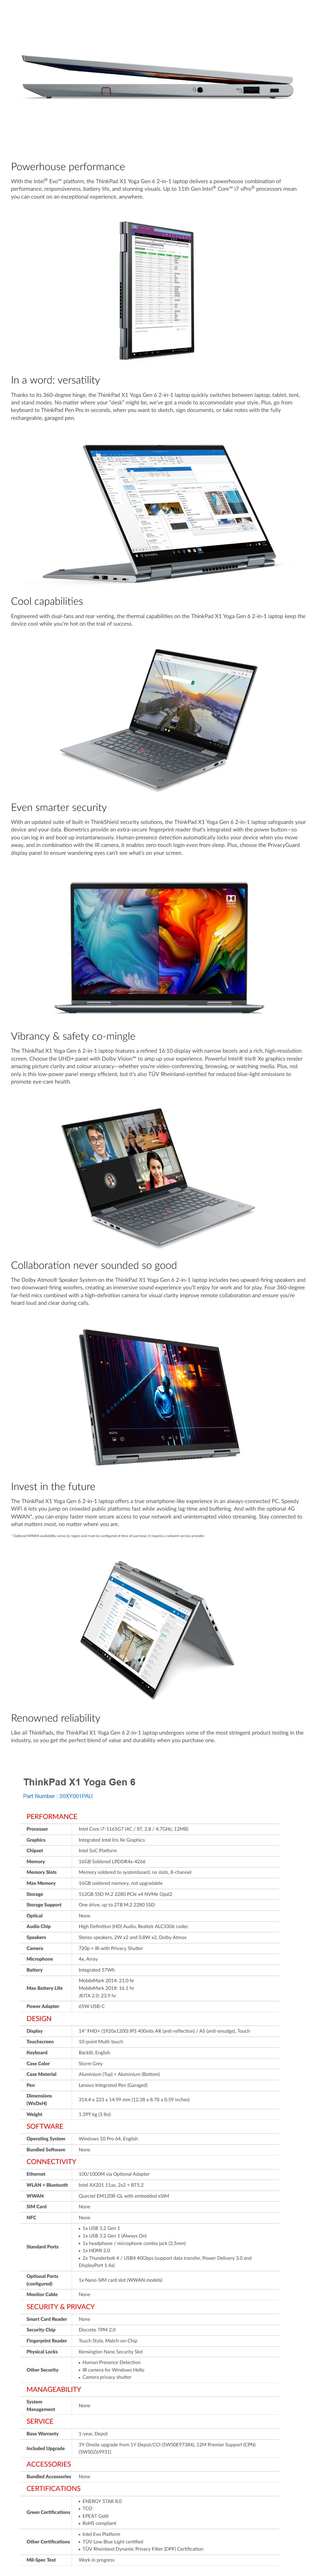 lenovo-thinkpad-x1-yoga-gen-6-flip-14-laptop-i71165g7-16gb-512gb-w10p-4g-touch-ac44415-10.jpg